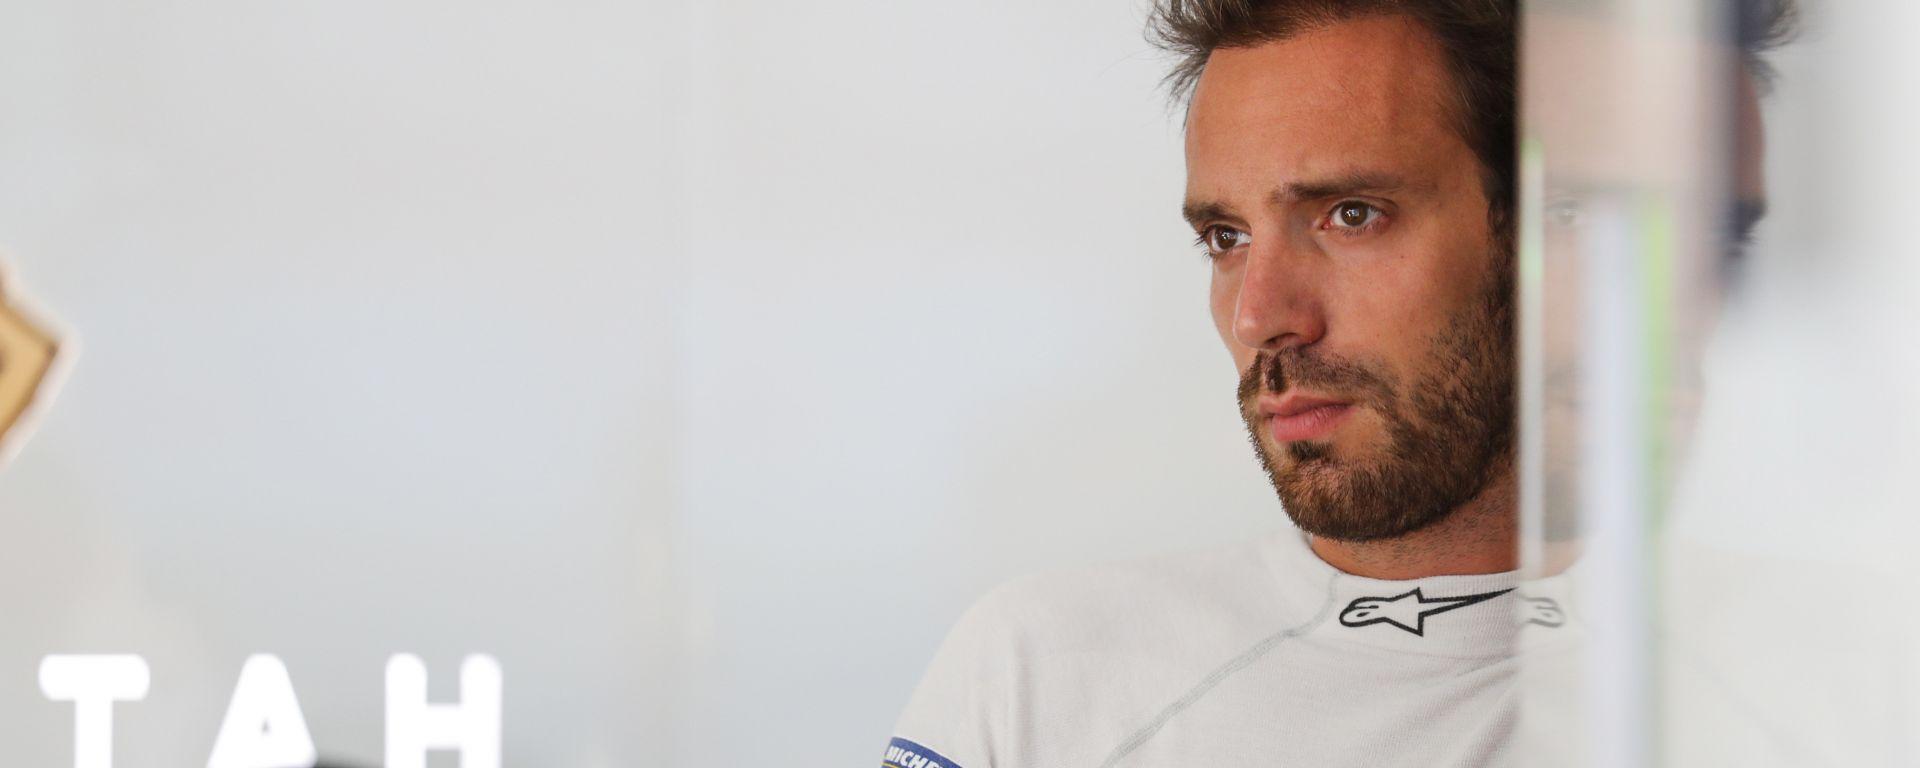 ePrix New York 2019, Jean-Eric Vergne ai box Ds Techeetah